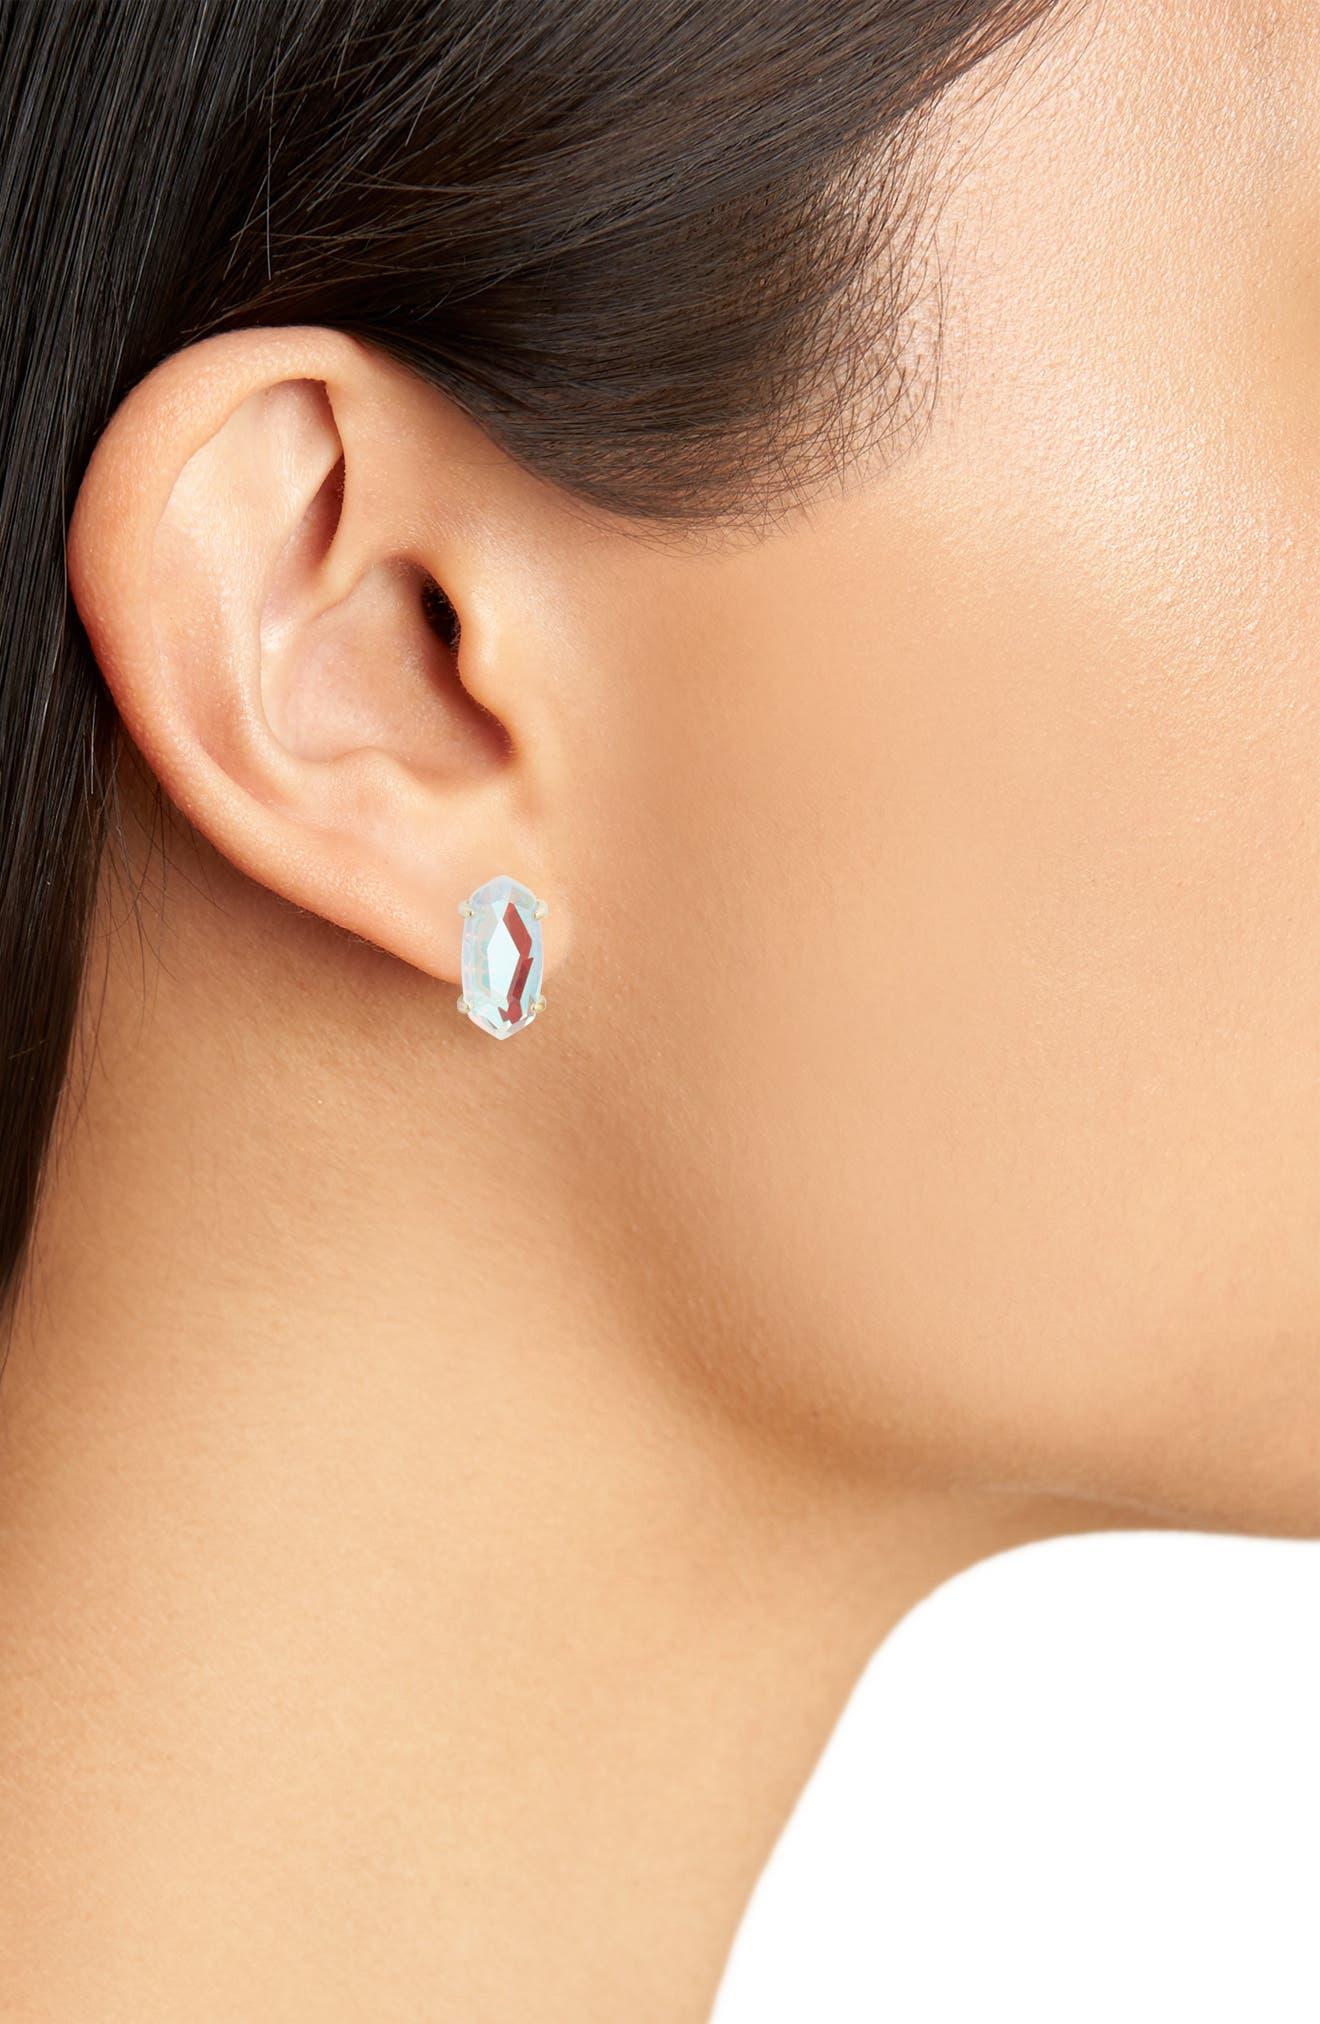 KENDRA SCOTT, Betty Stud Earrings, Alternate thumbnail 2, color, DICHROIC GLASS/ GOLD